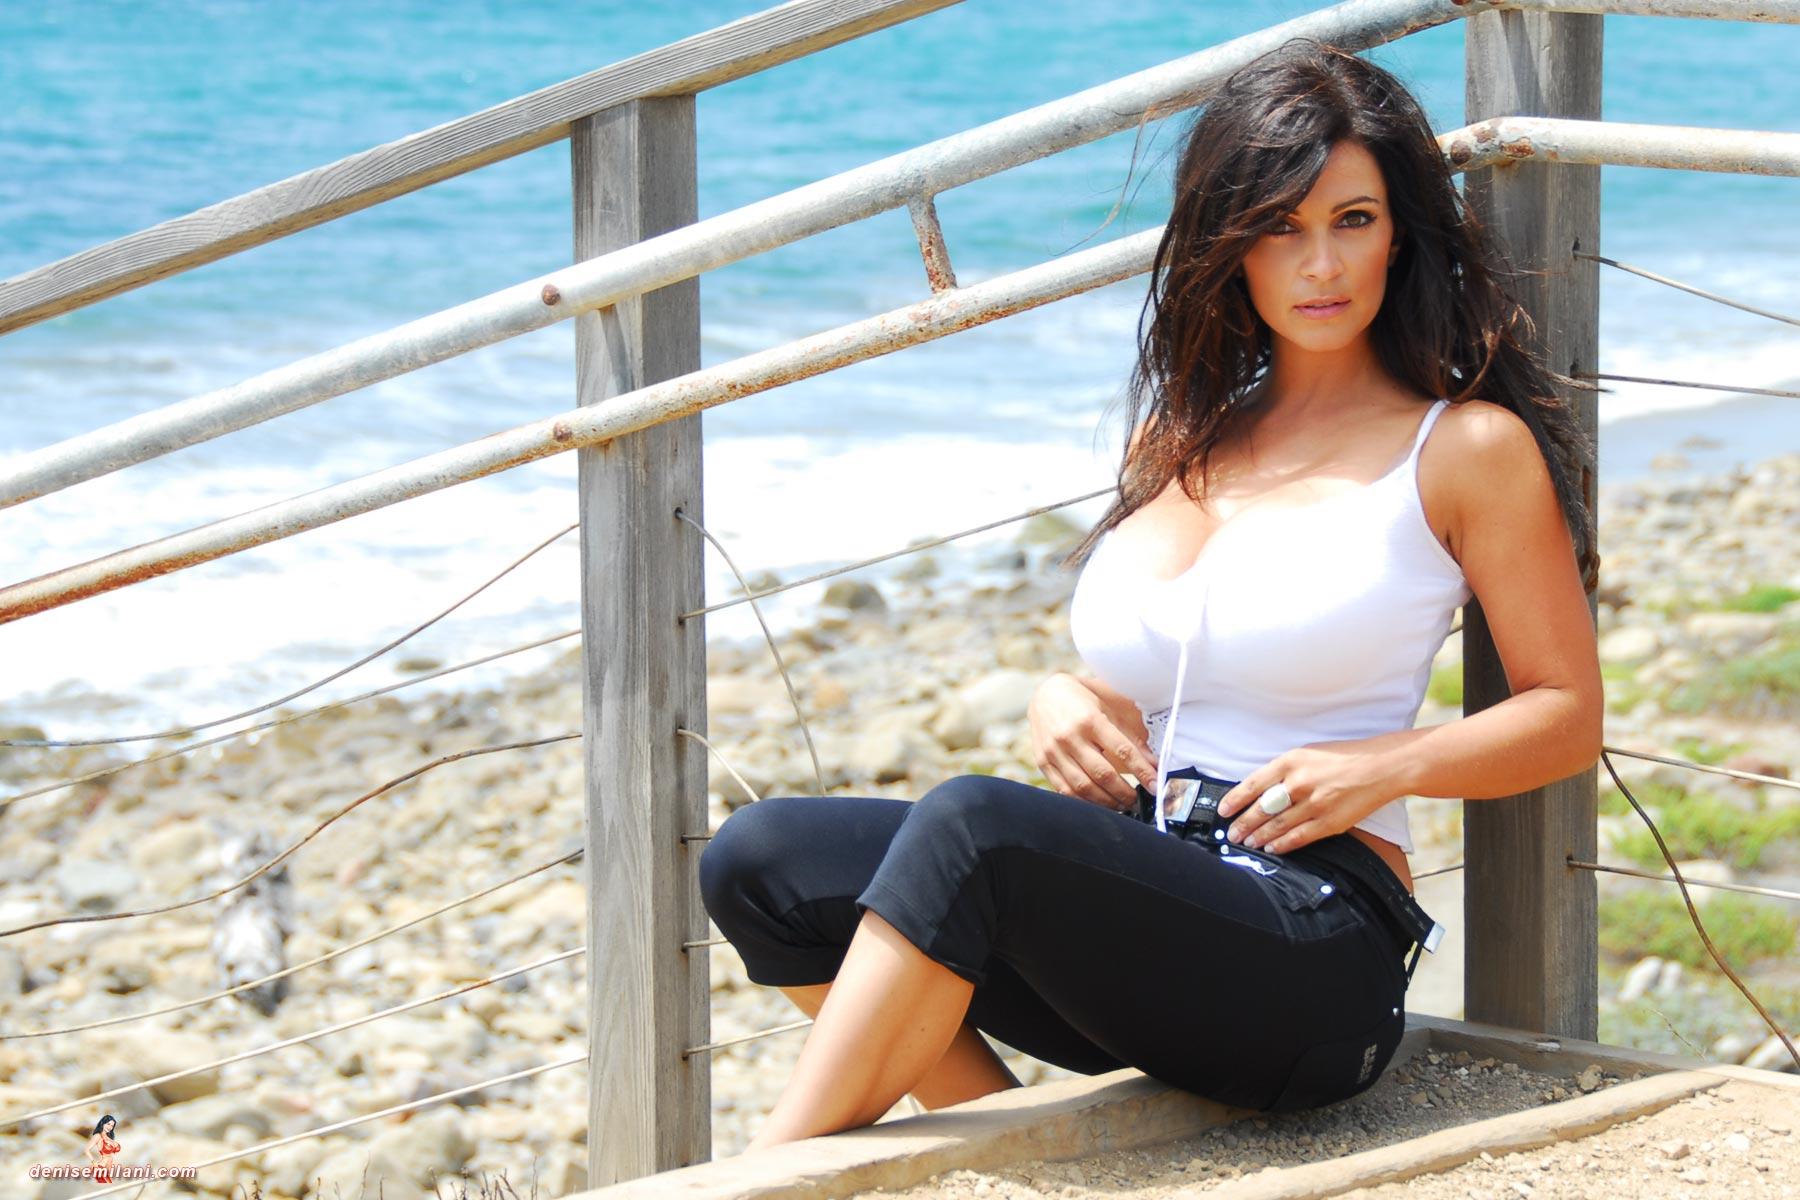 denise milani blue dress - photo #36